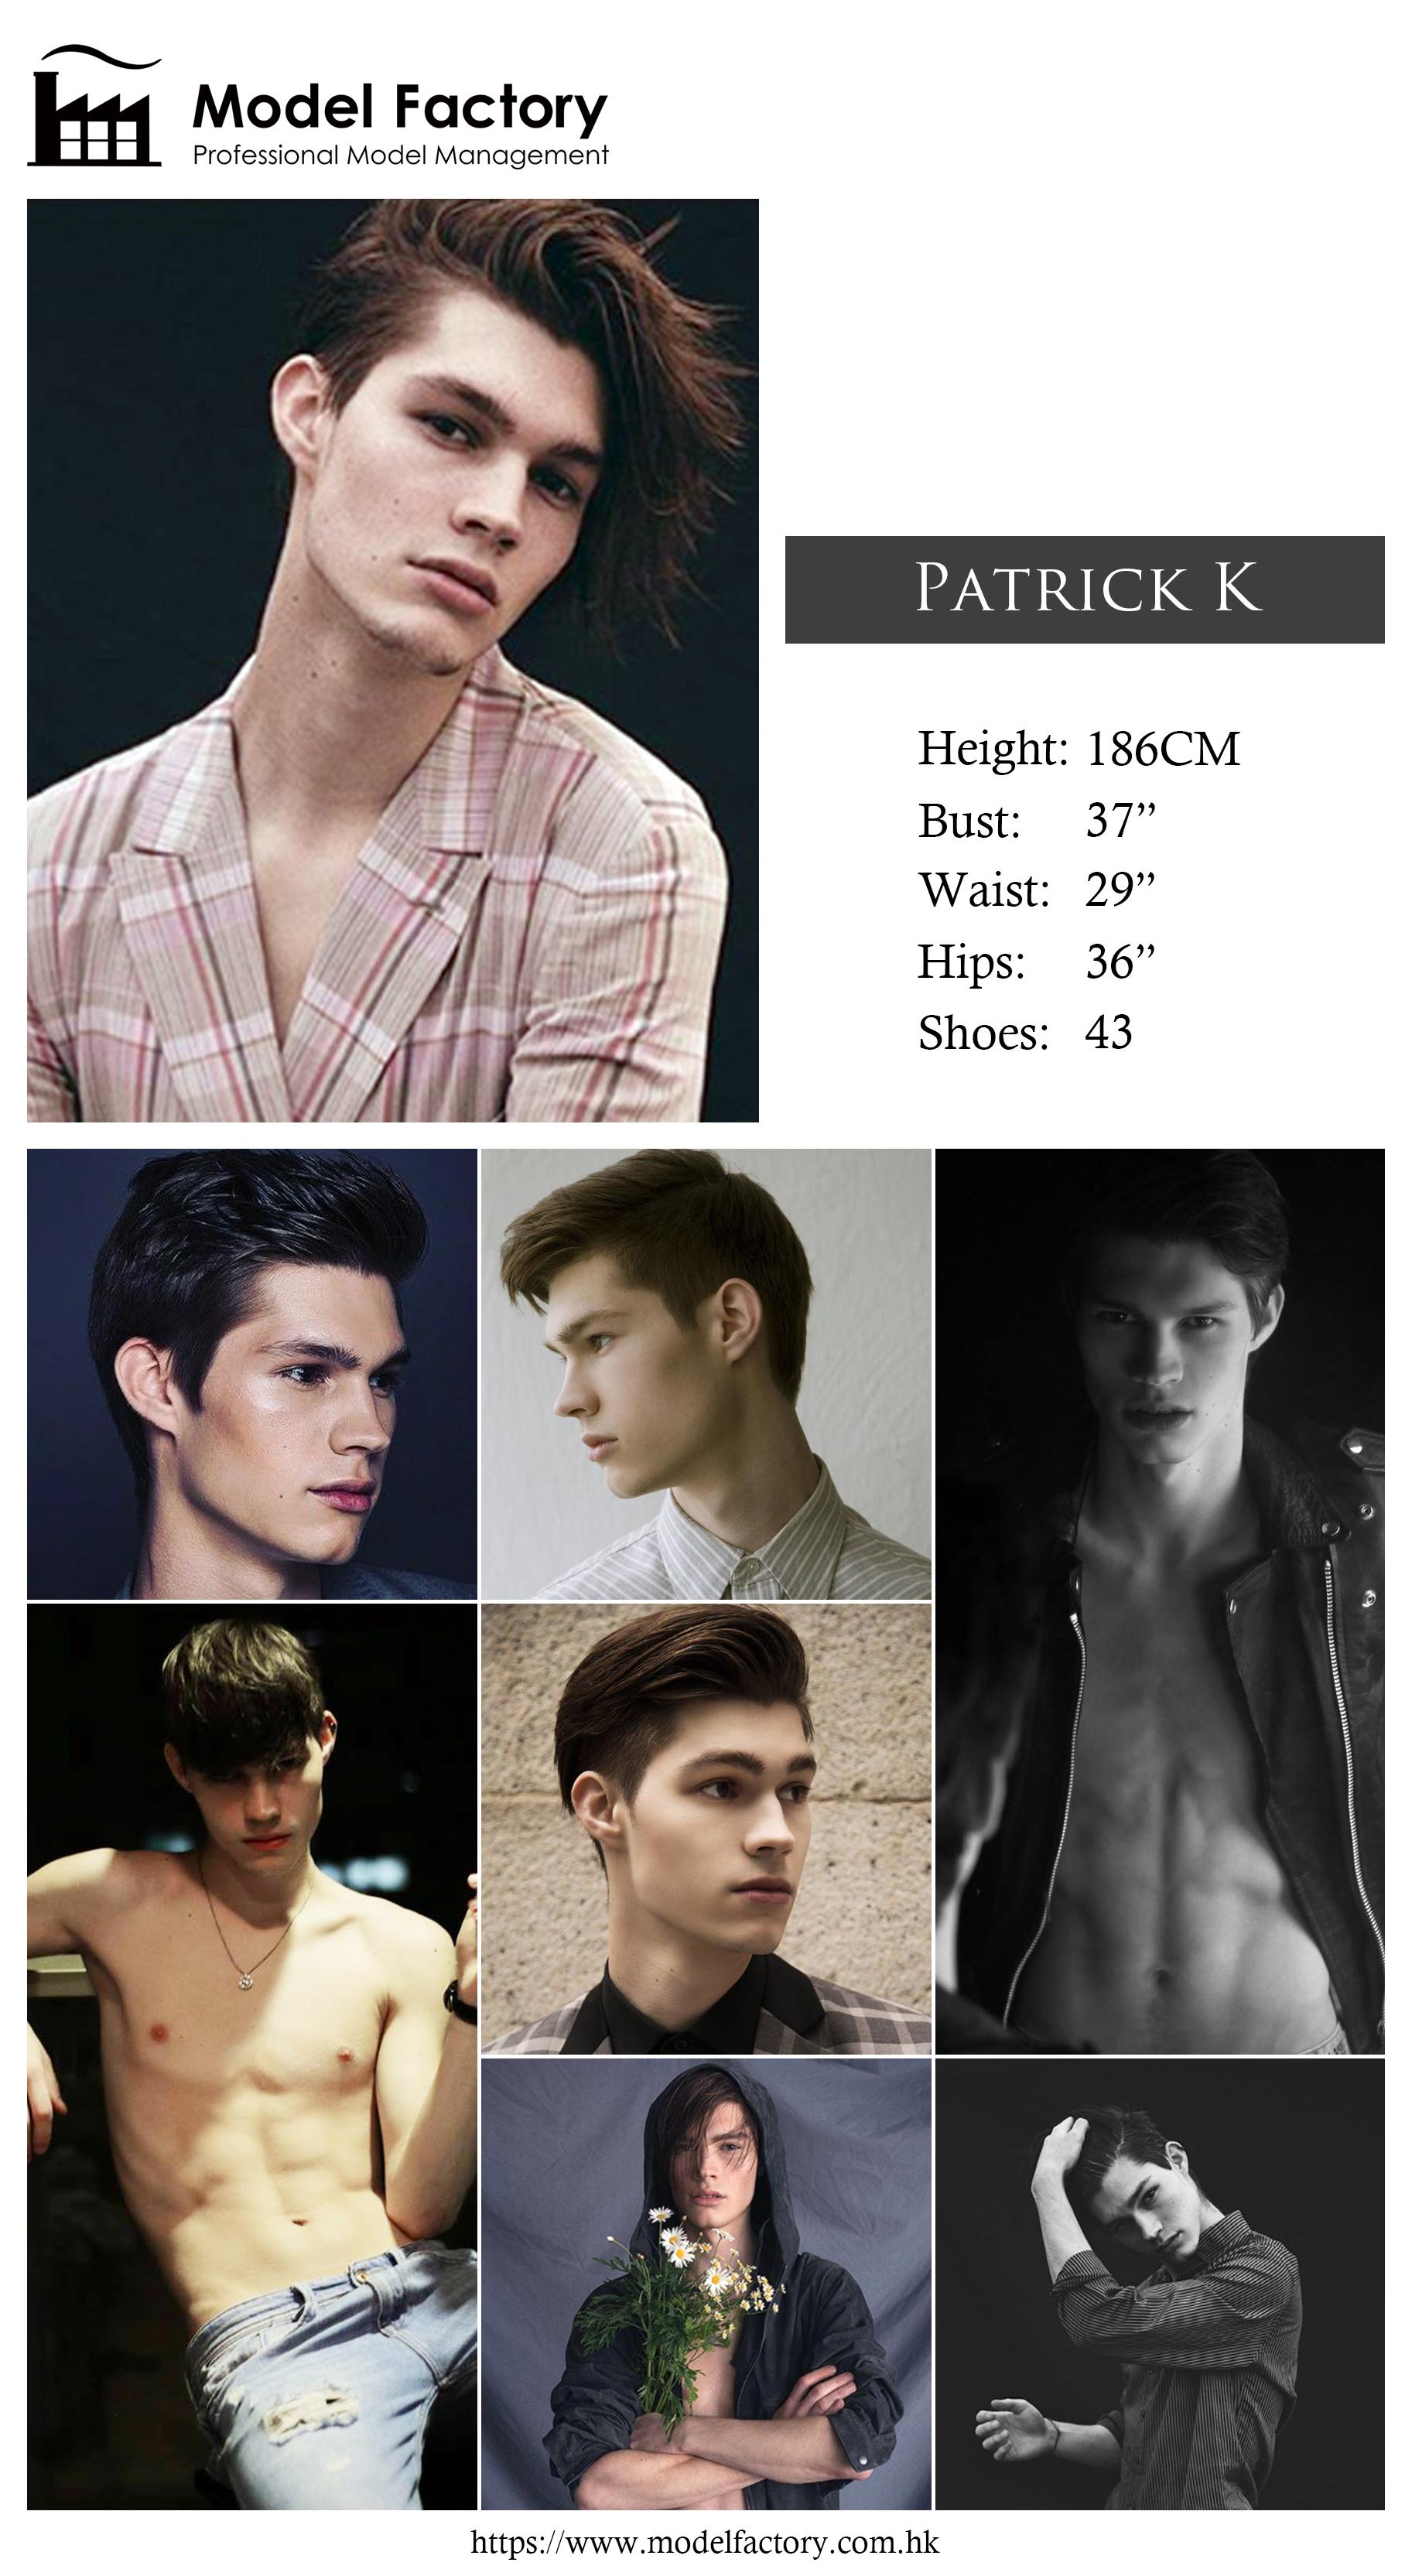 Model Factory Caucasian Male Model PatrickK